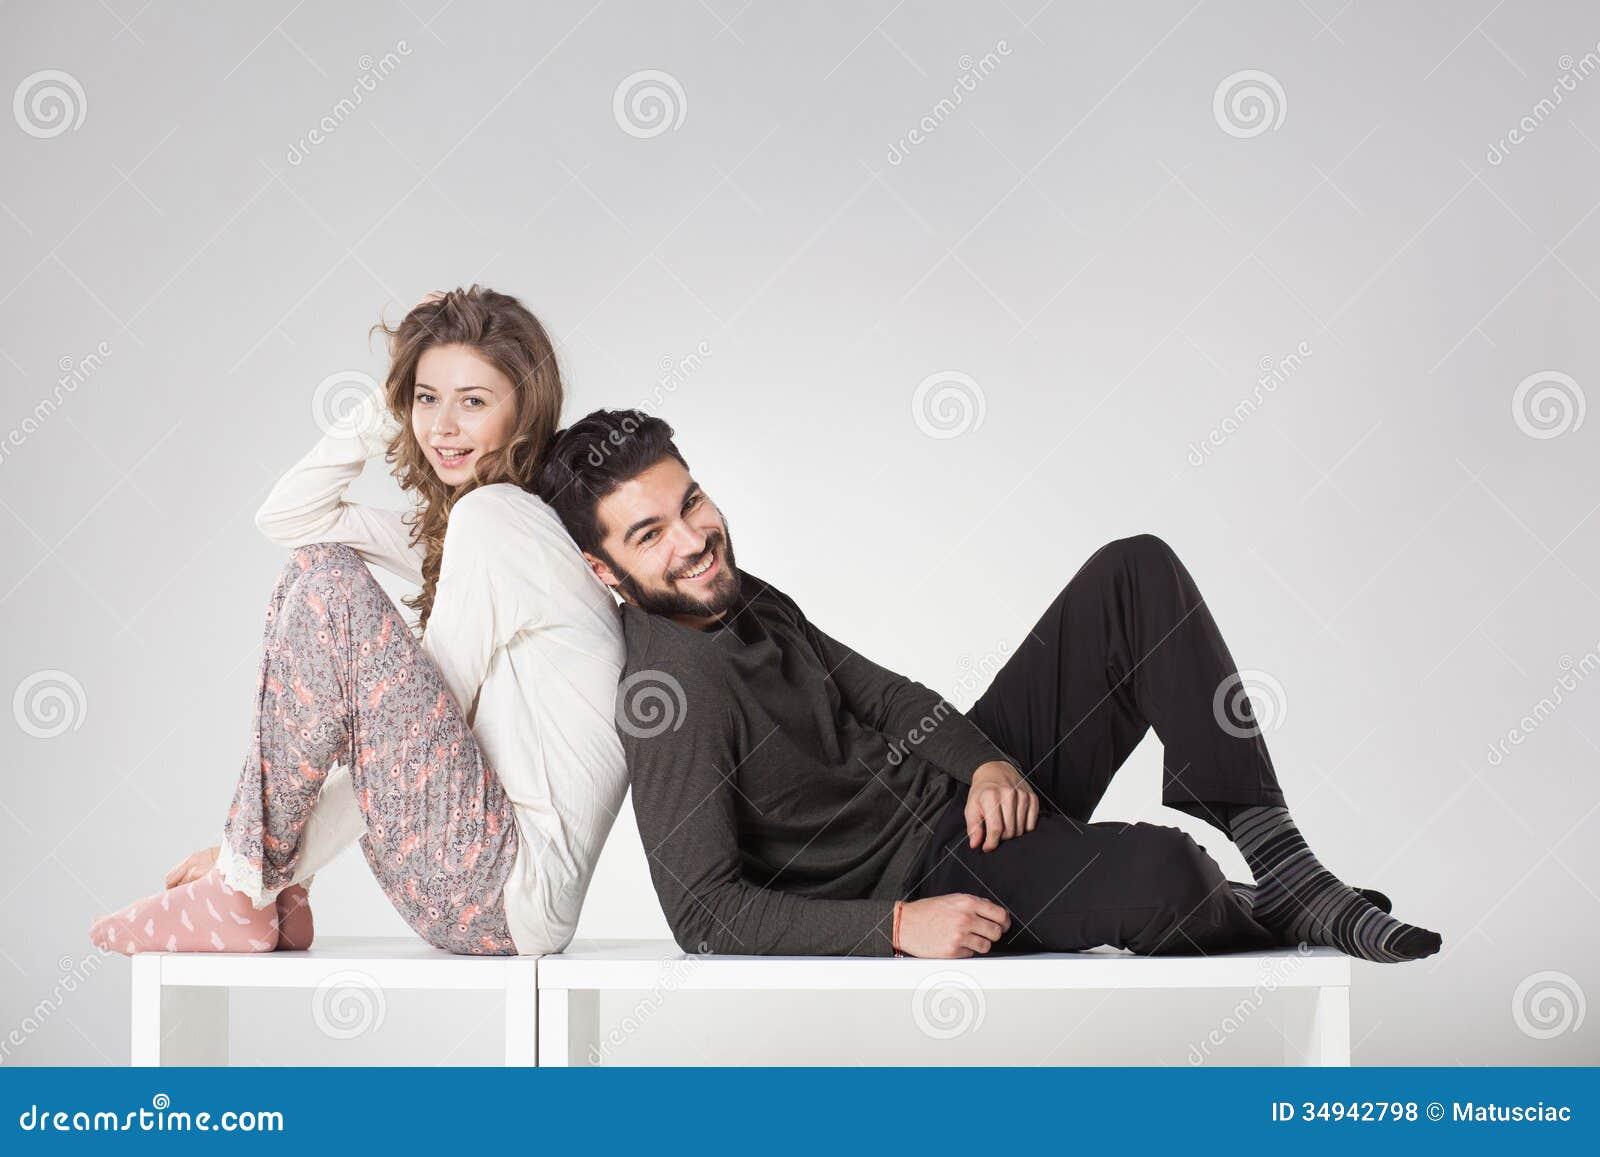 Happy Couple In Pyjama Posing In The Studio Royalty Free Stock Photos ...